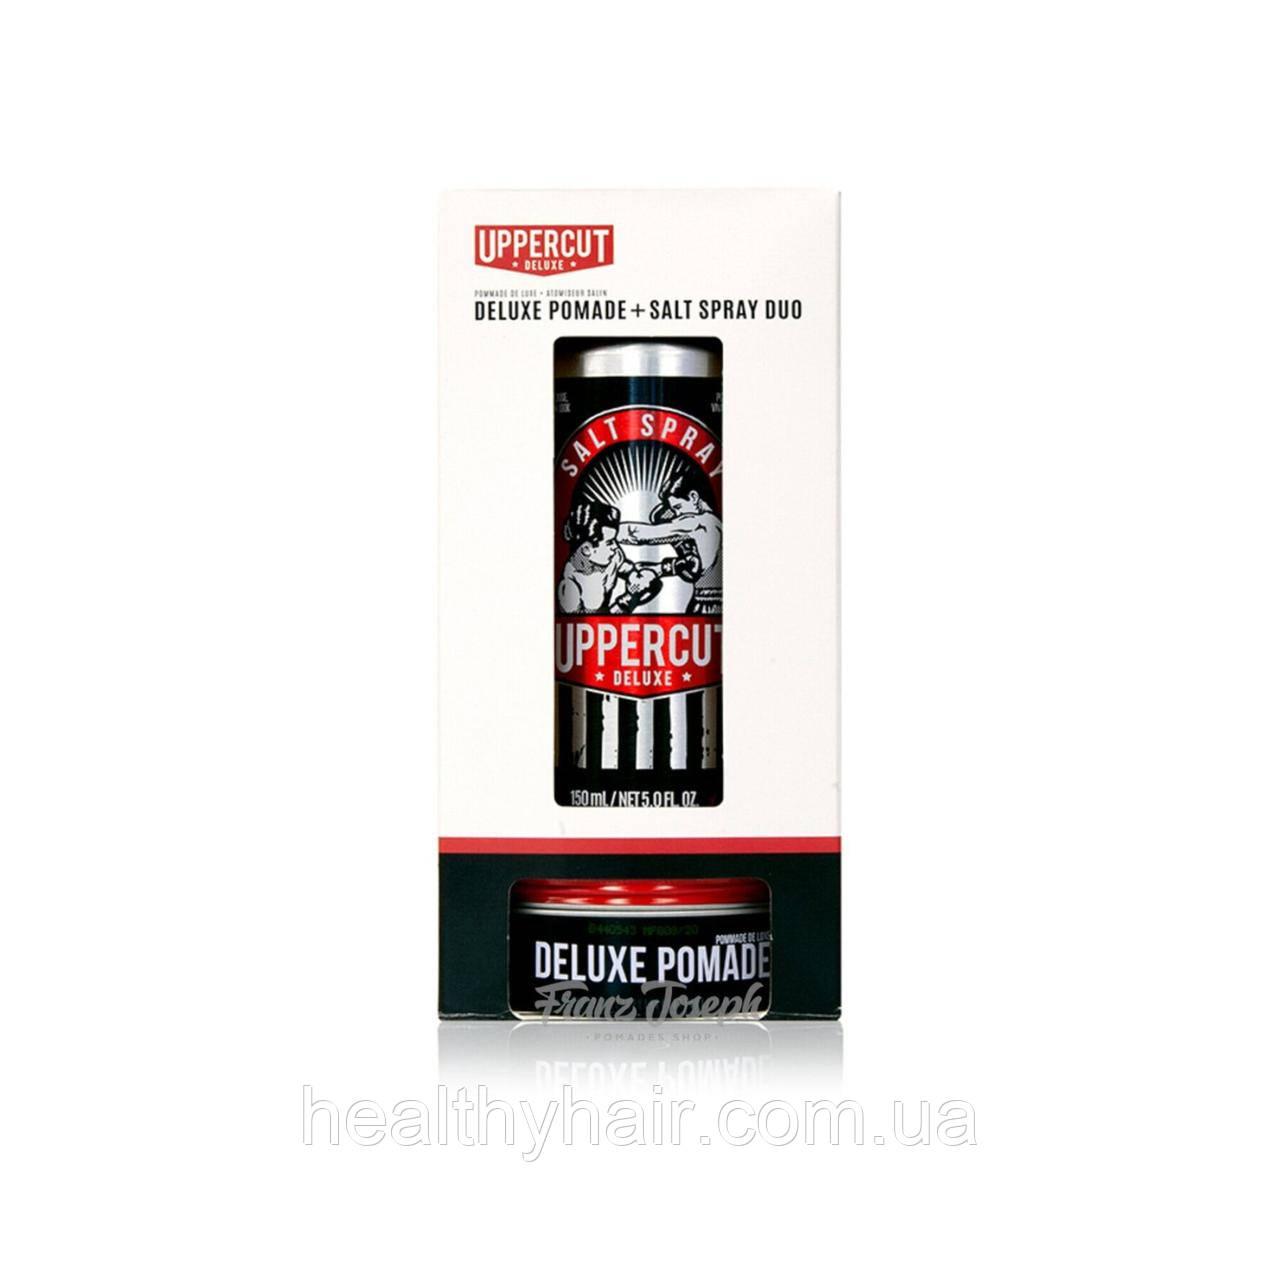 Набор Uppercut Deluxe Pomade & Salt Spray Duo